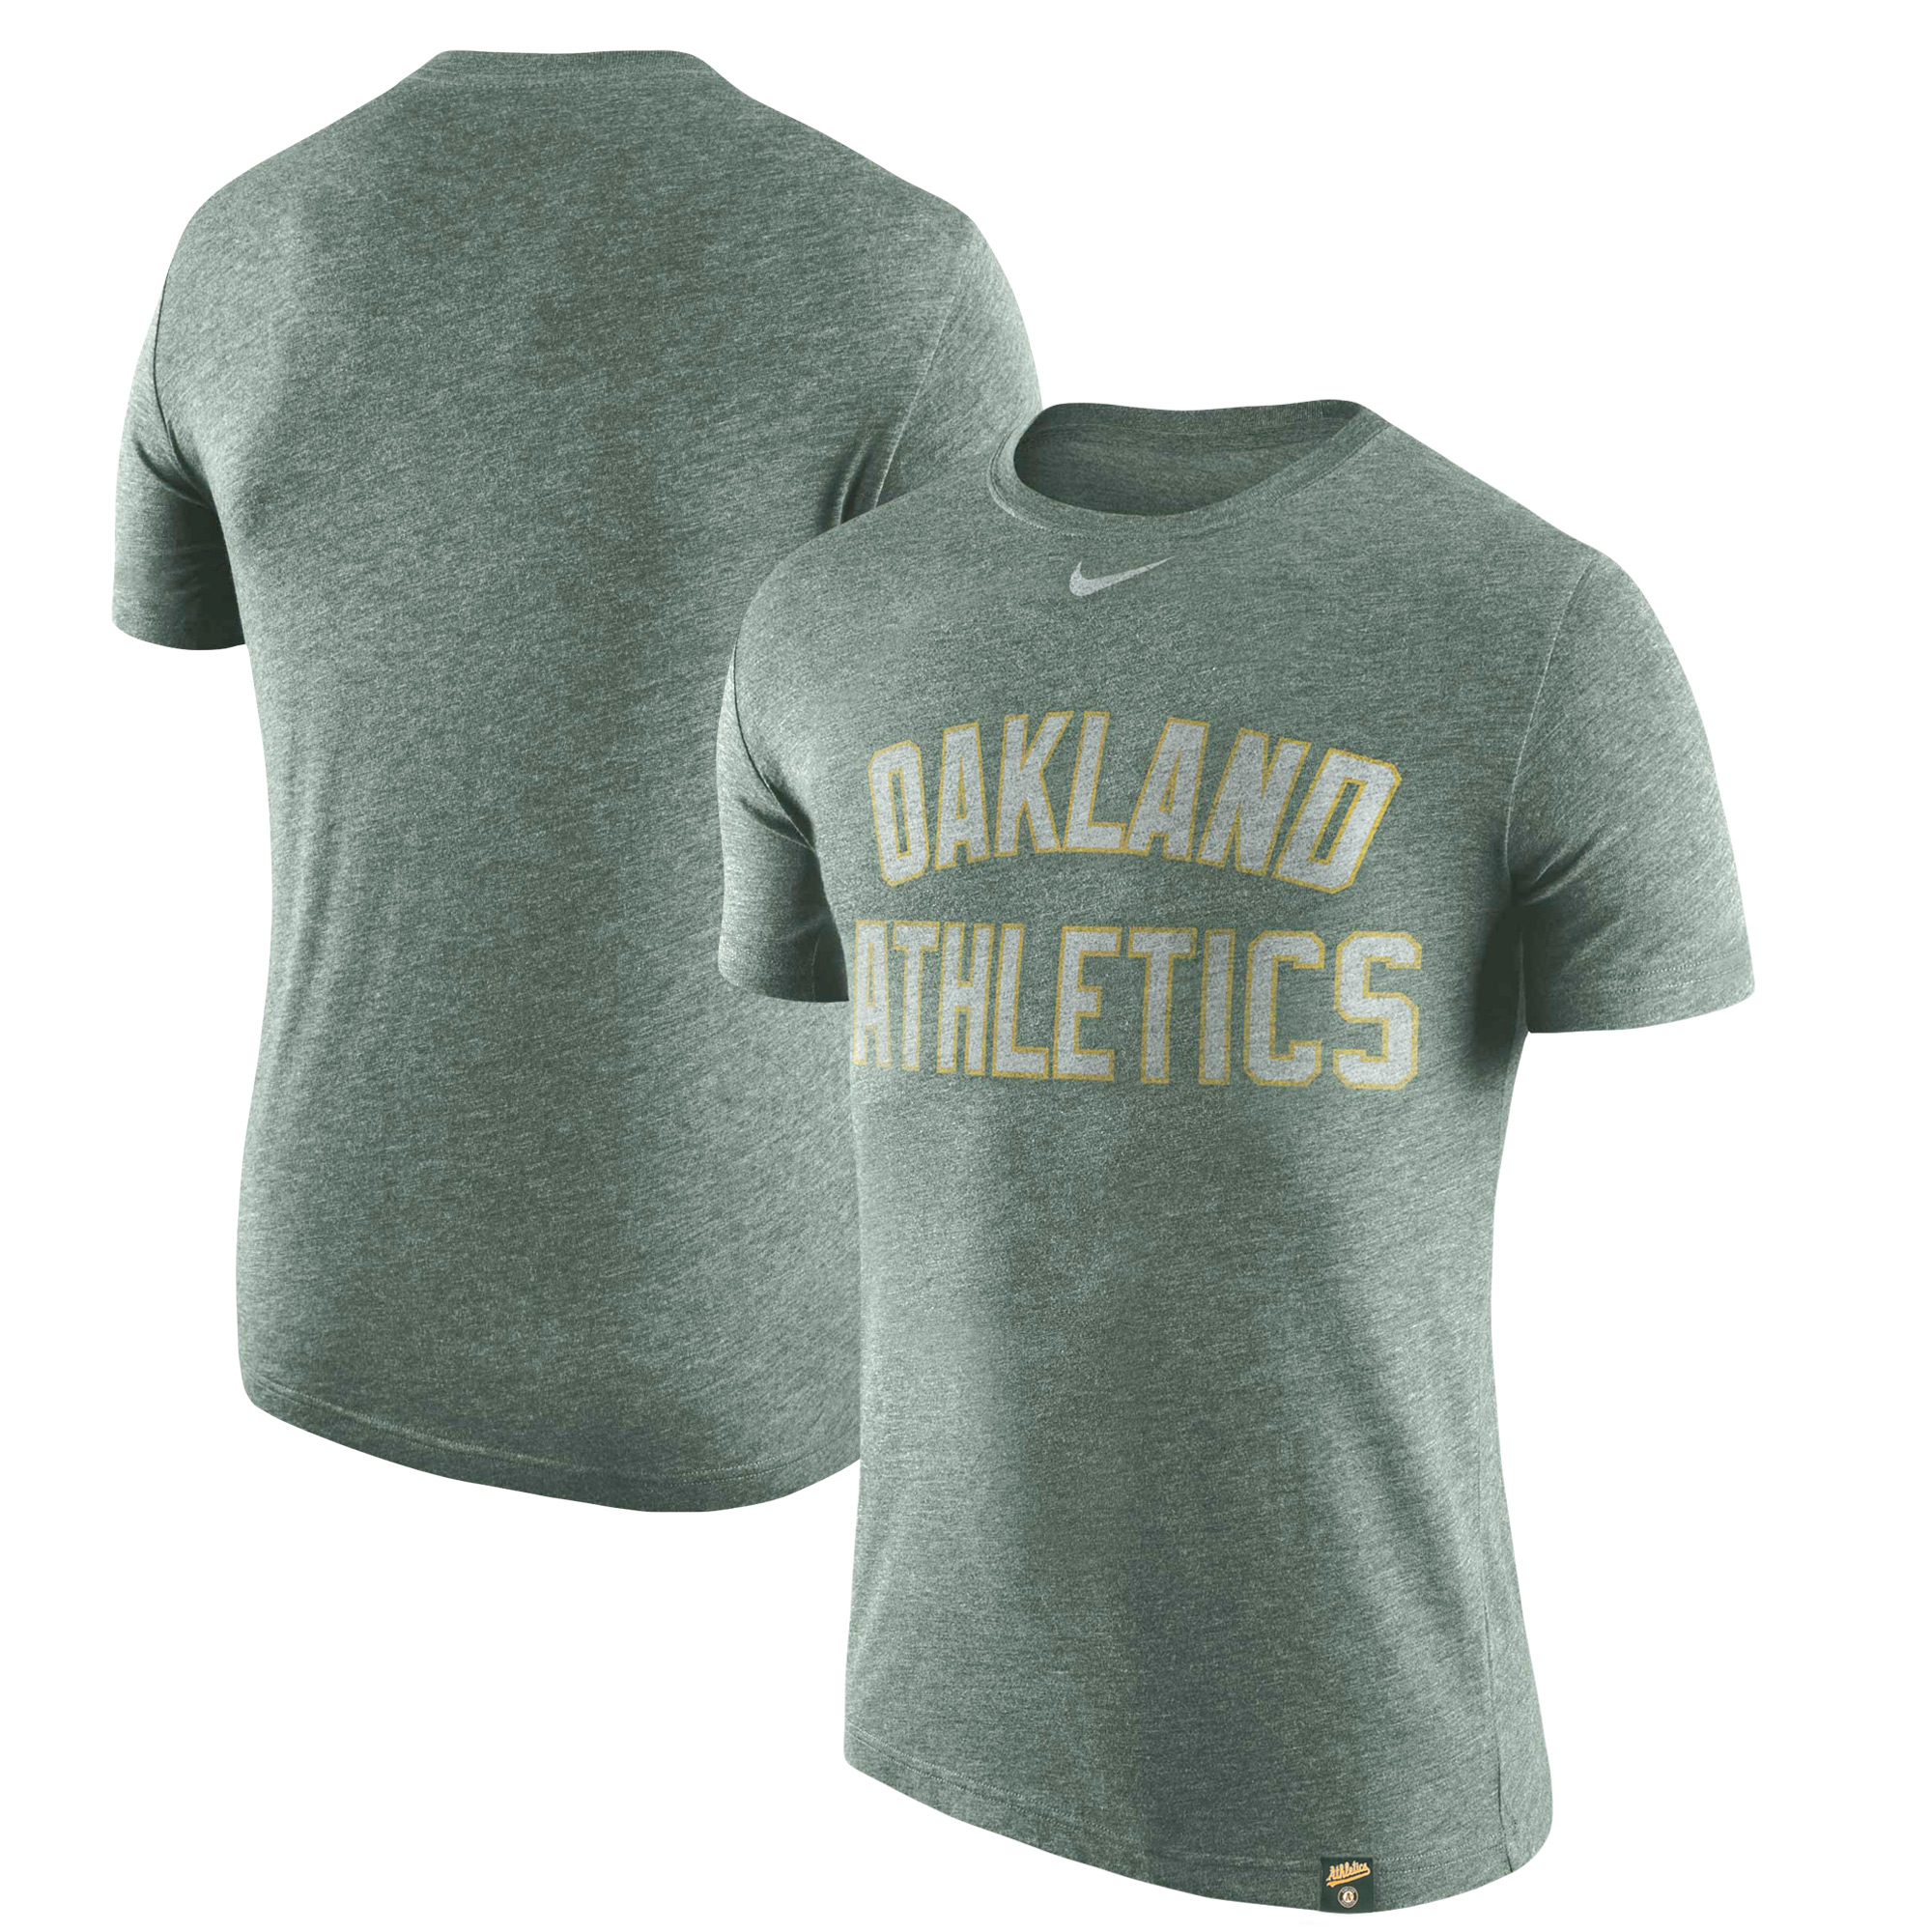 Oakland Athletics Nike Tri-Blend DNA Wordmark Performance T-Shirt - Heathered Green